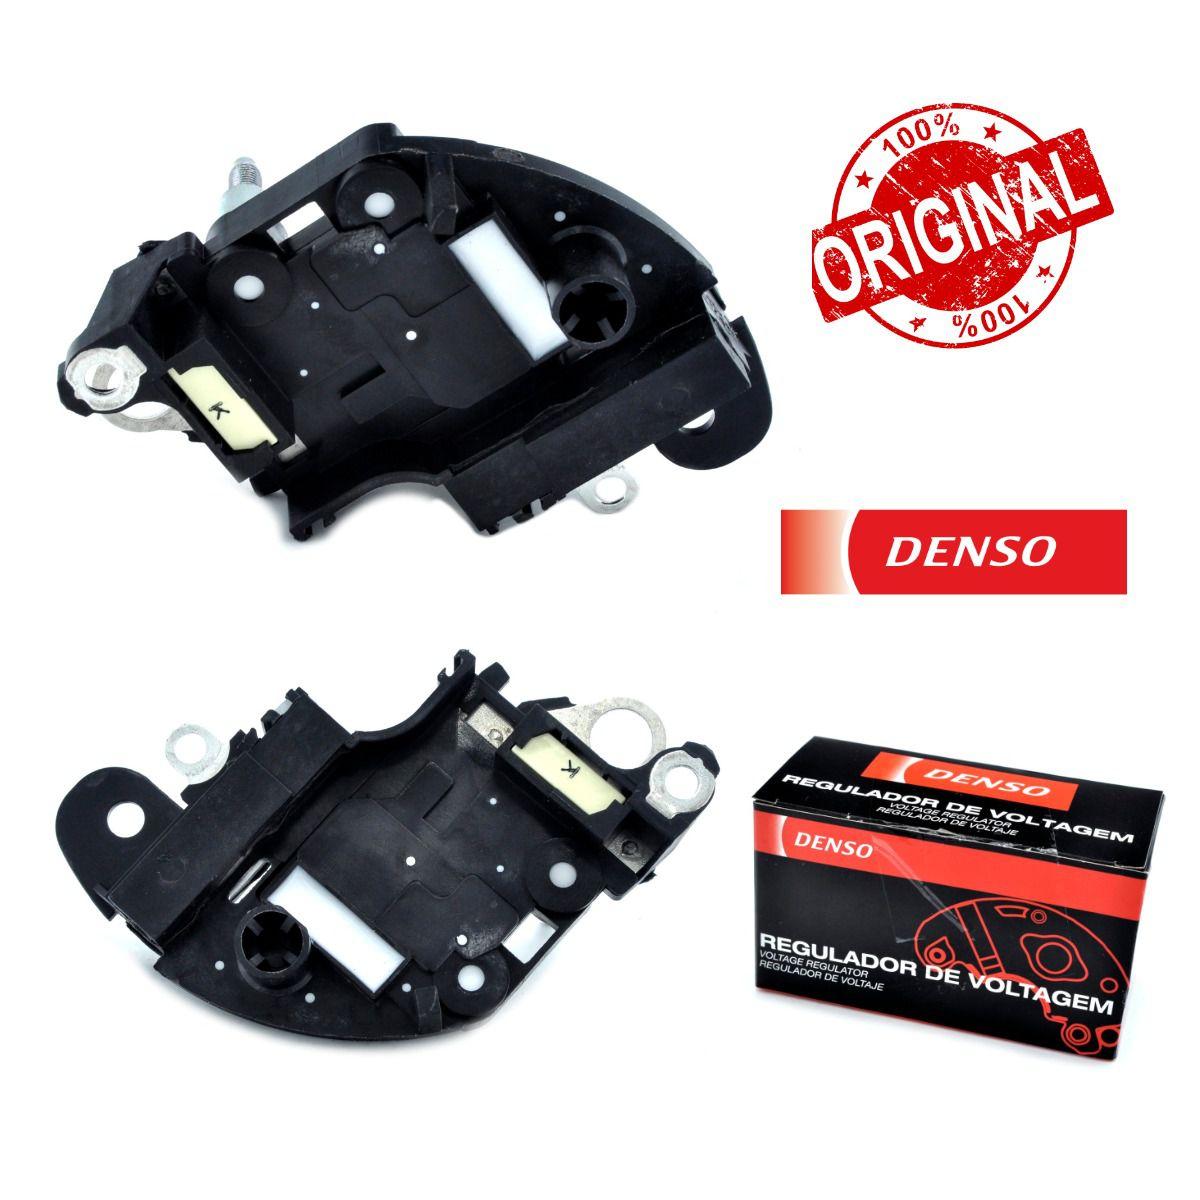 Regulador de Voltagem Fiat / Chevrolet BC021680-5160RC - Denso